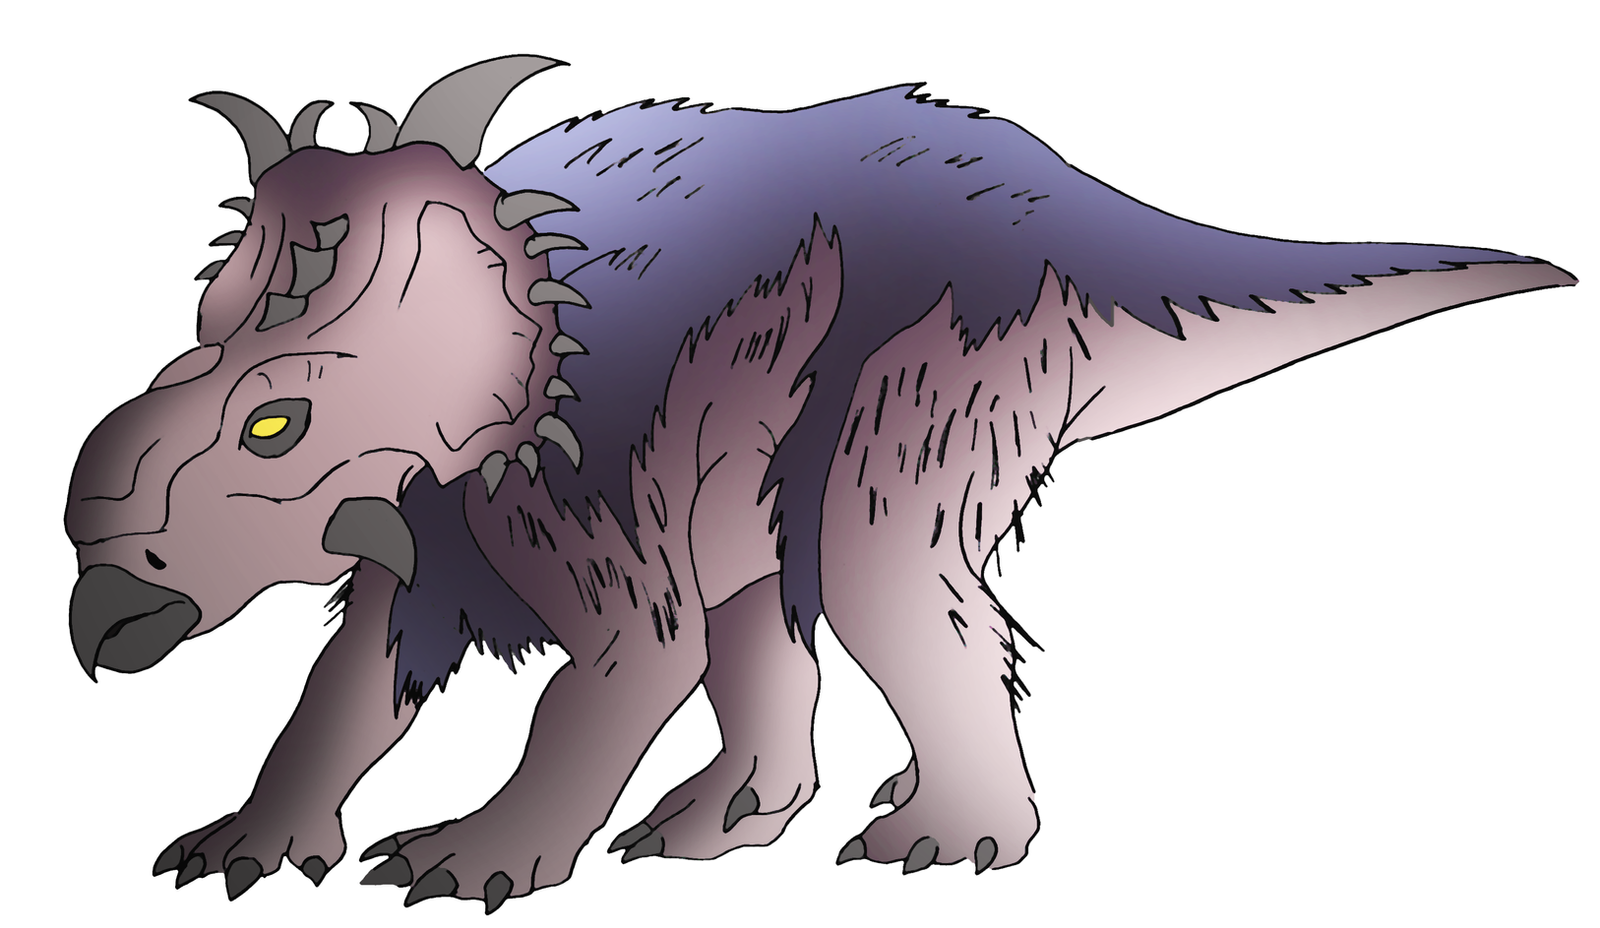 Pachyrhinosaurus by NickOnPlanetRipple